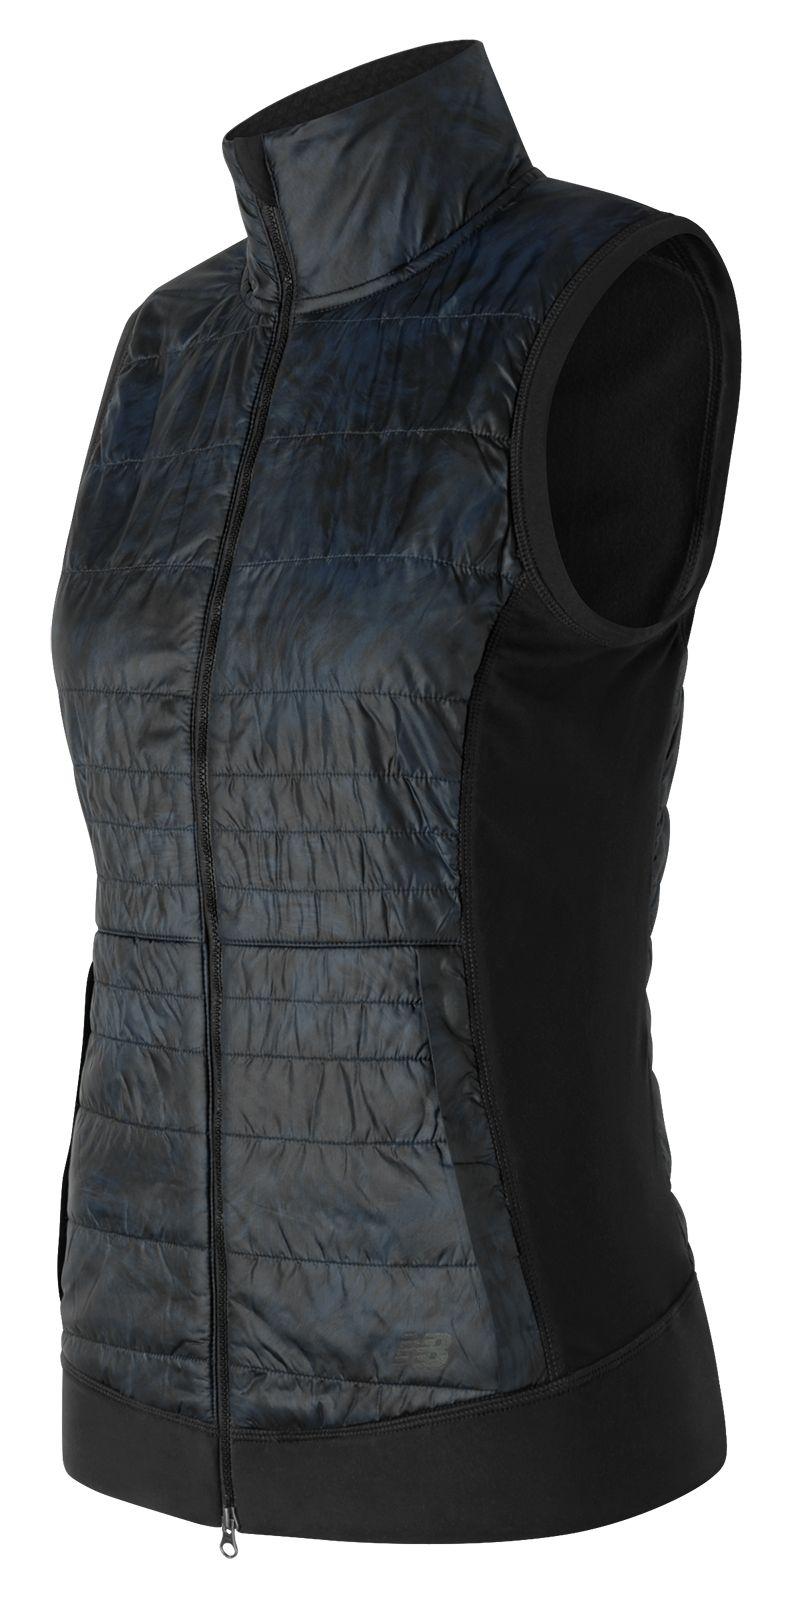 New Balance : NB Heat Hybrid Vest : Women's Apparel : WV63121GFP